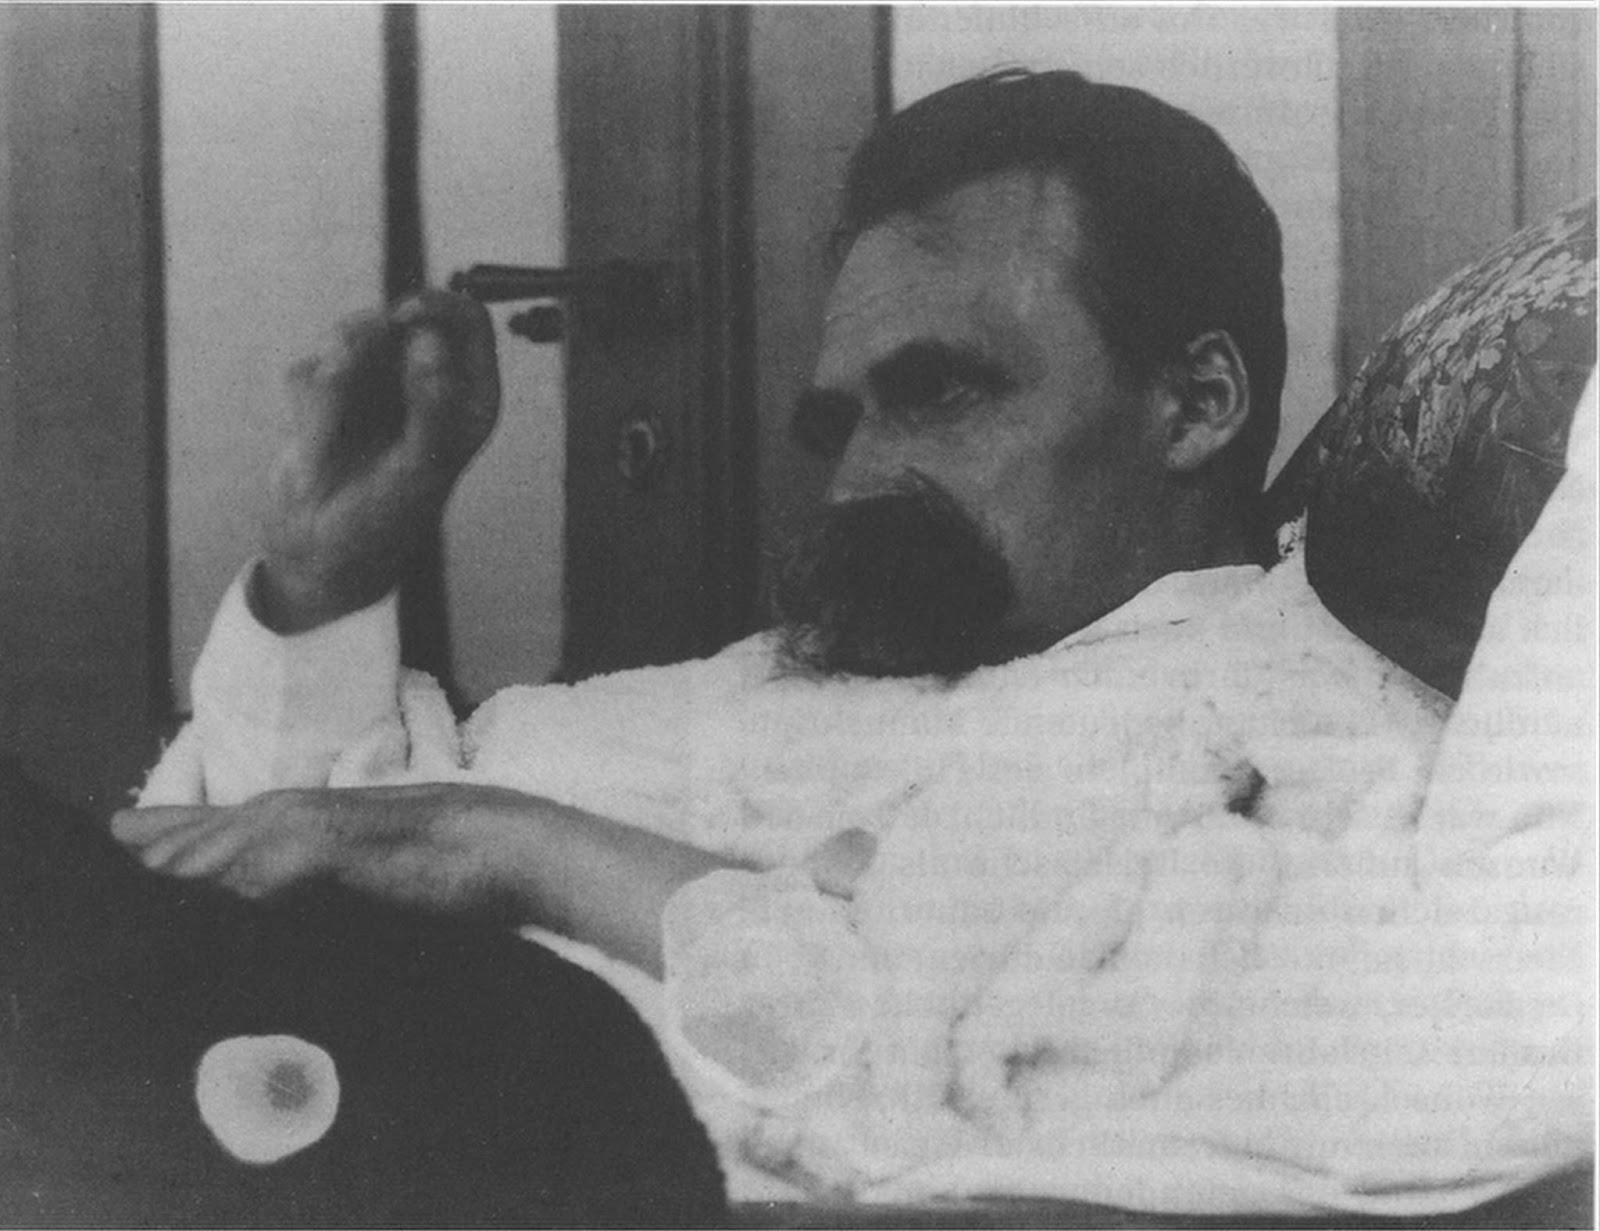 Nietzsche com insanidade mental